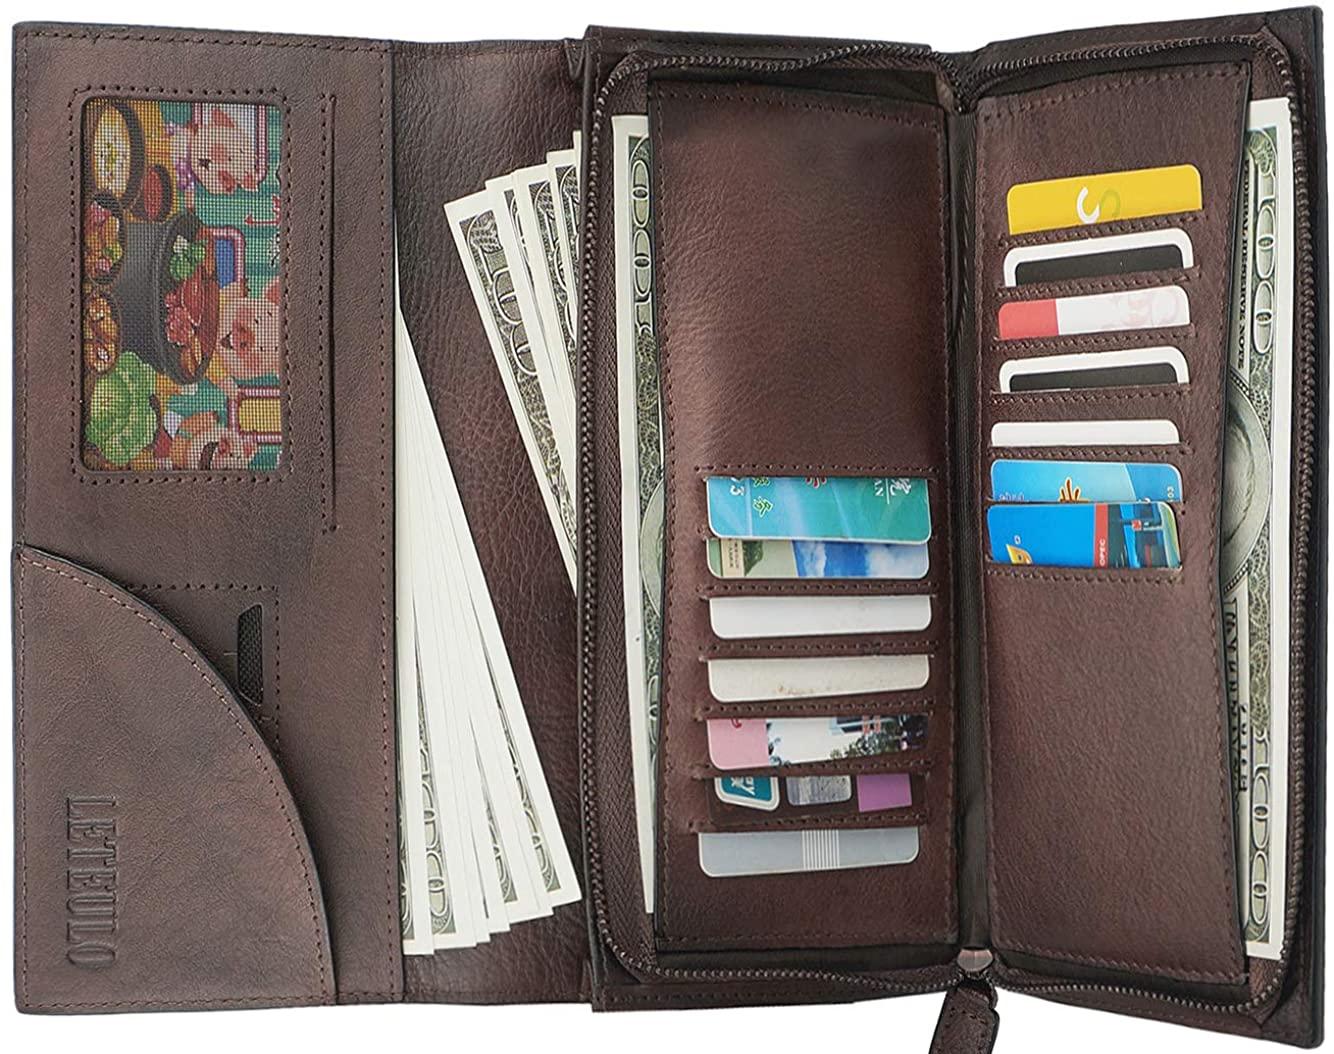 Womens Wallet Genuine Leather Dip Dye Card Organizer Ladies Purse Large Capacity Clutch